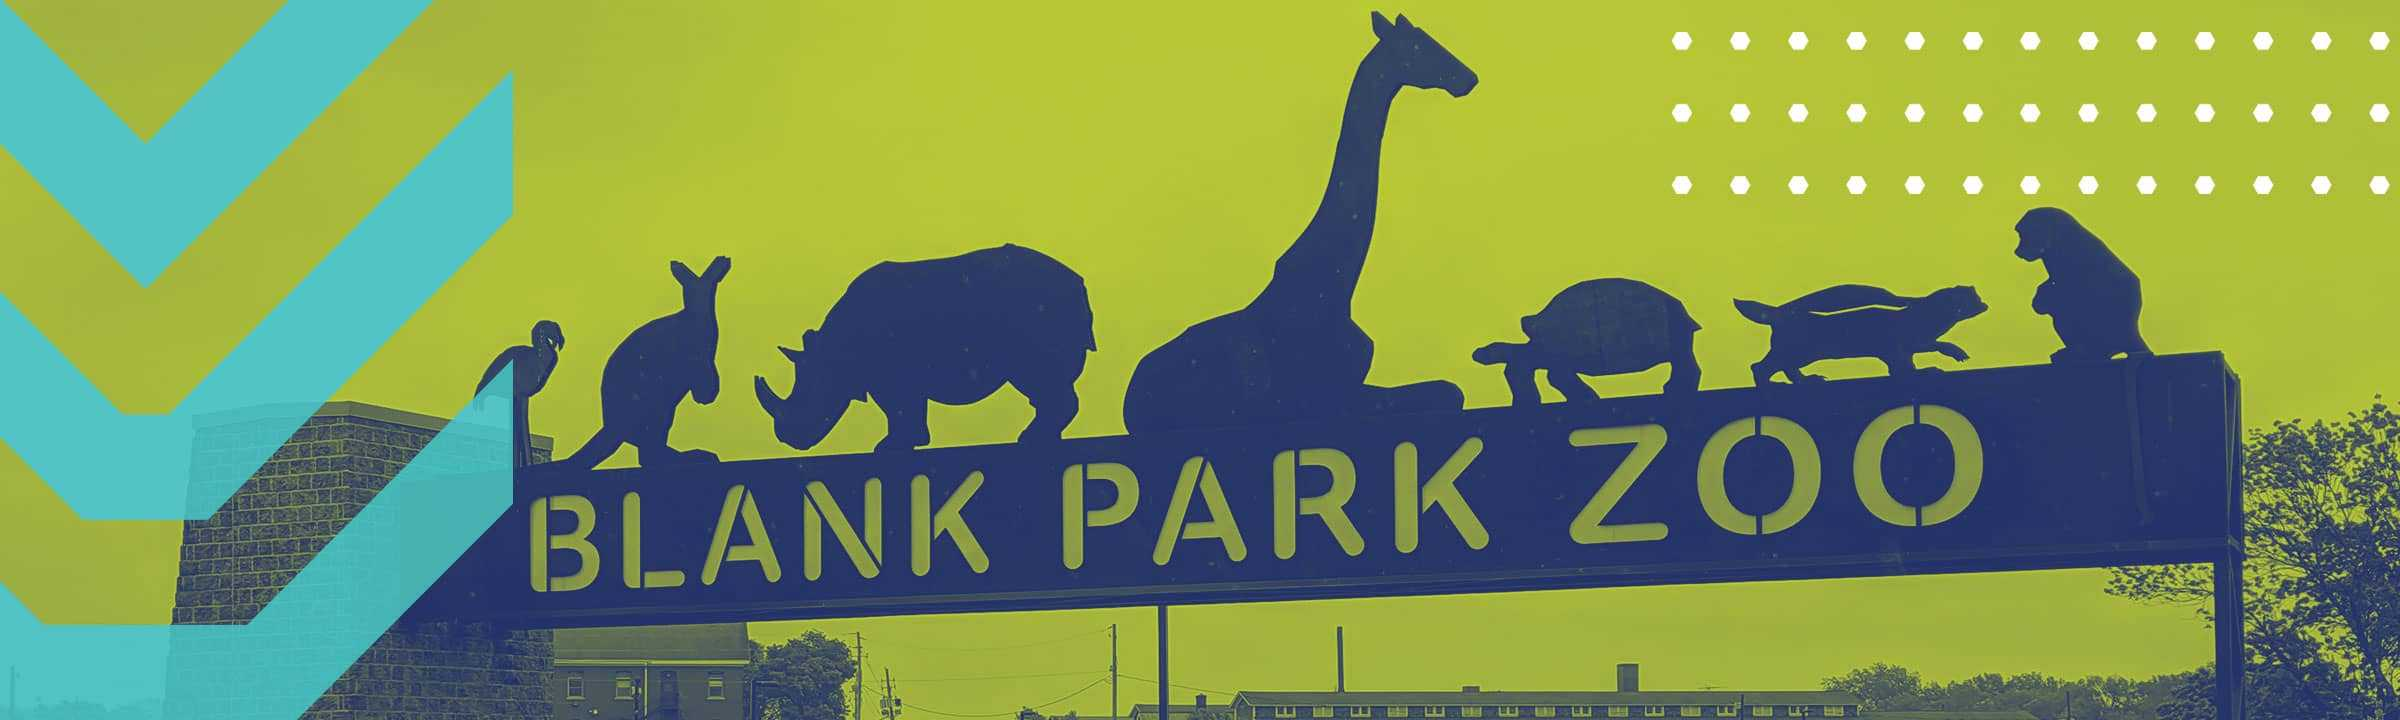 Blank Park Zoo Sign